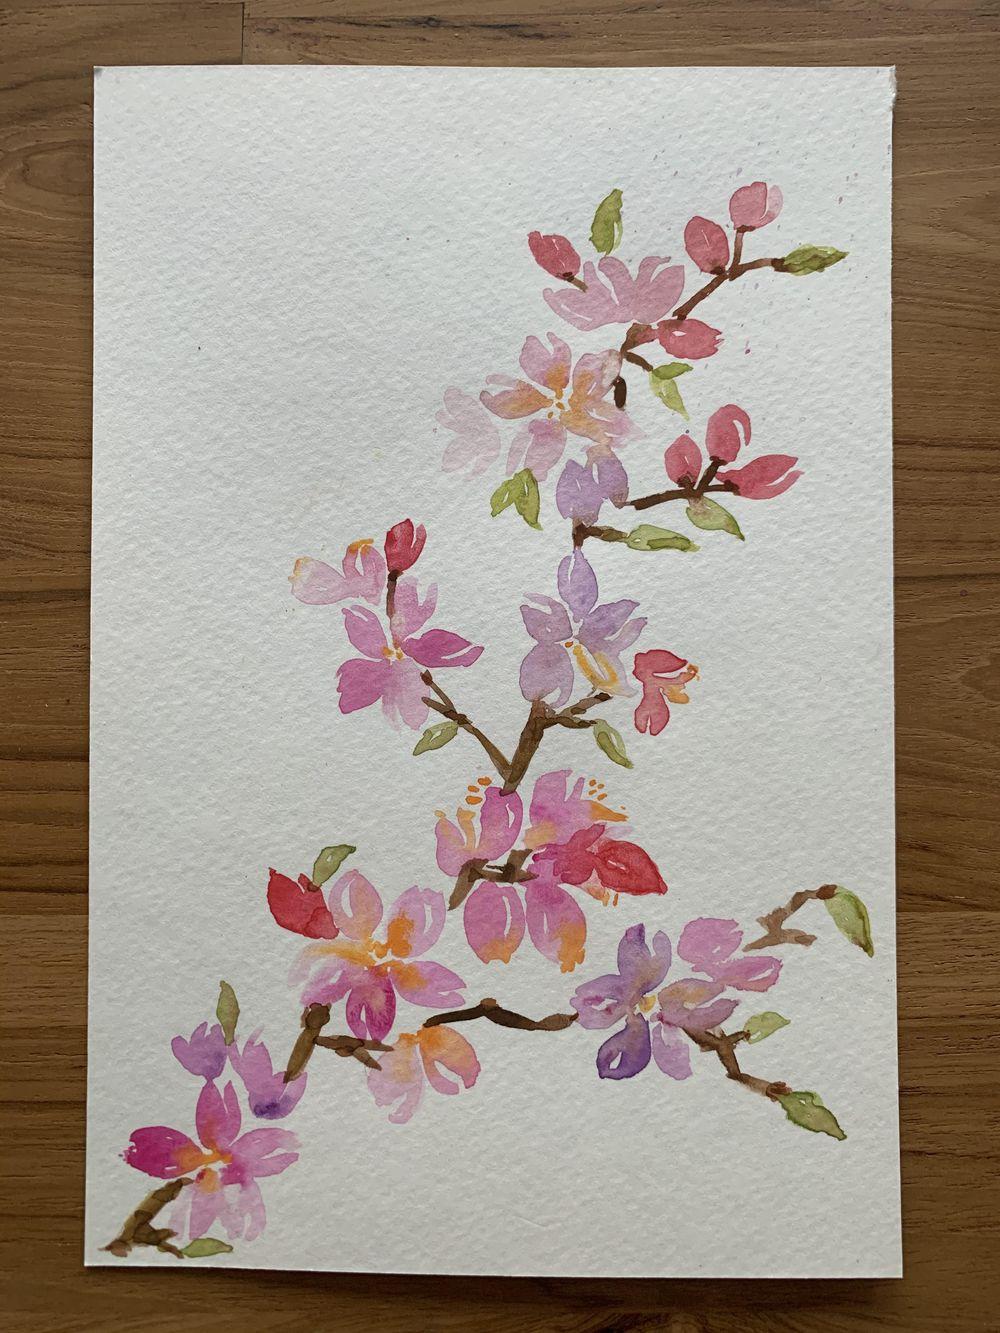 Luminous Watercolor Florals - image 2 - student project